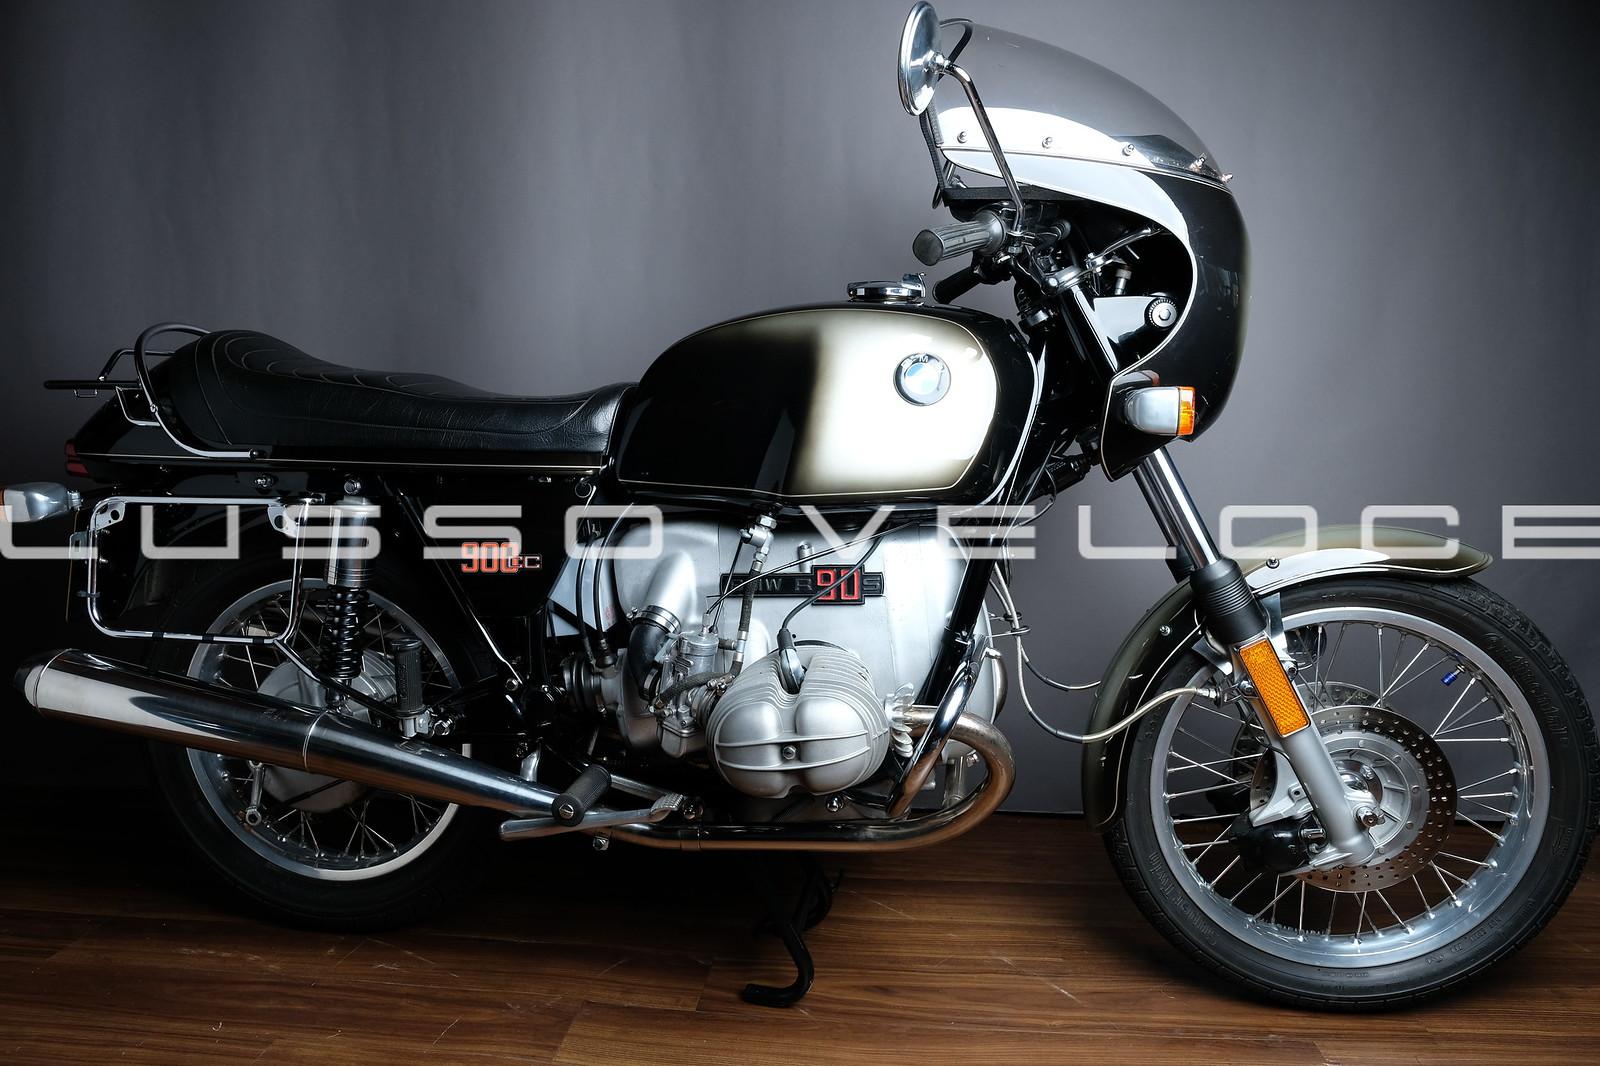 BMW R90 S